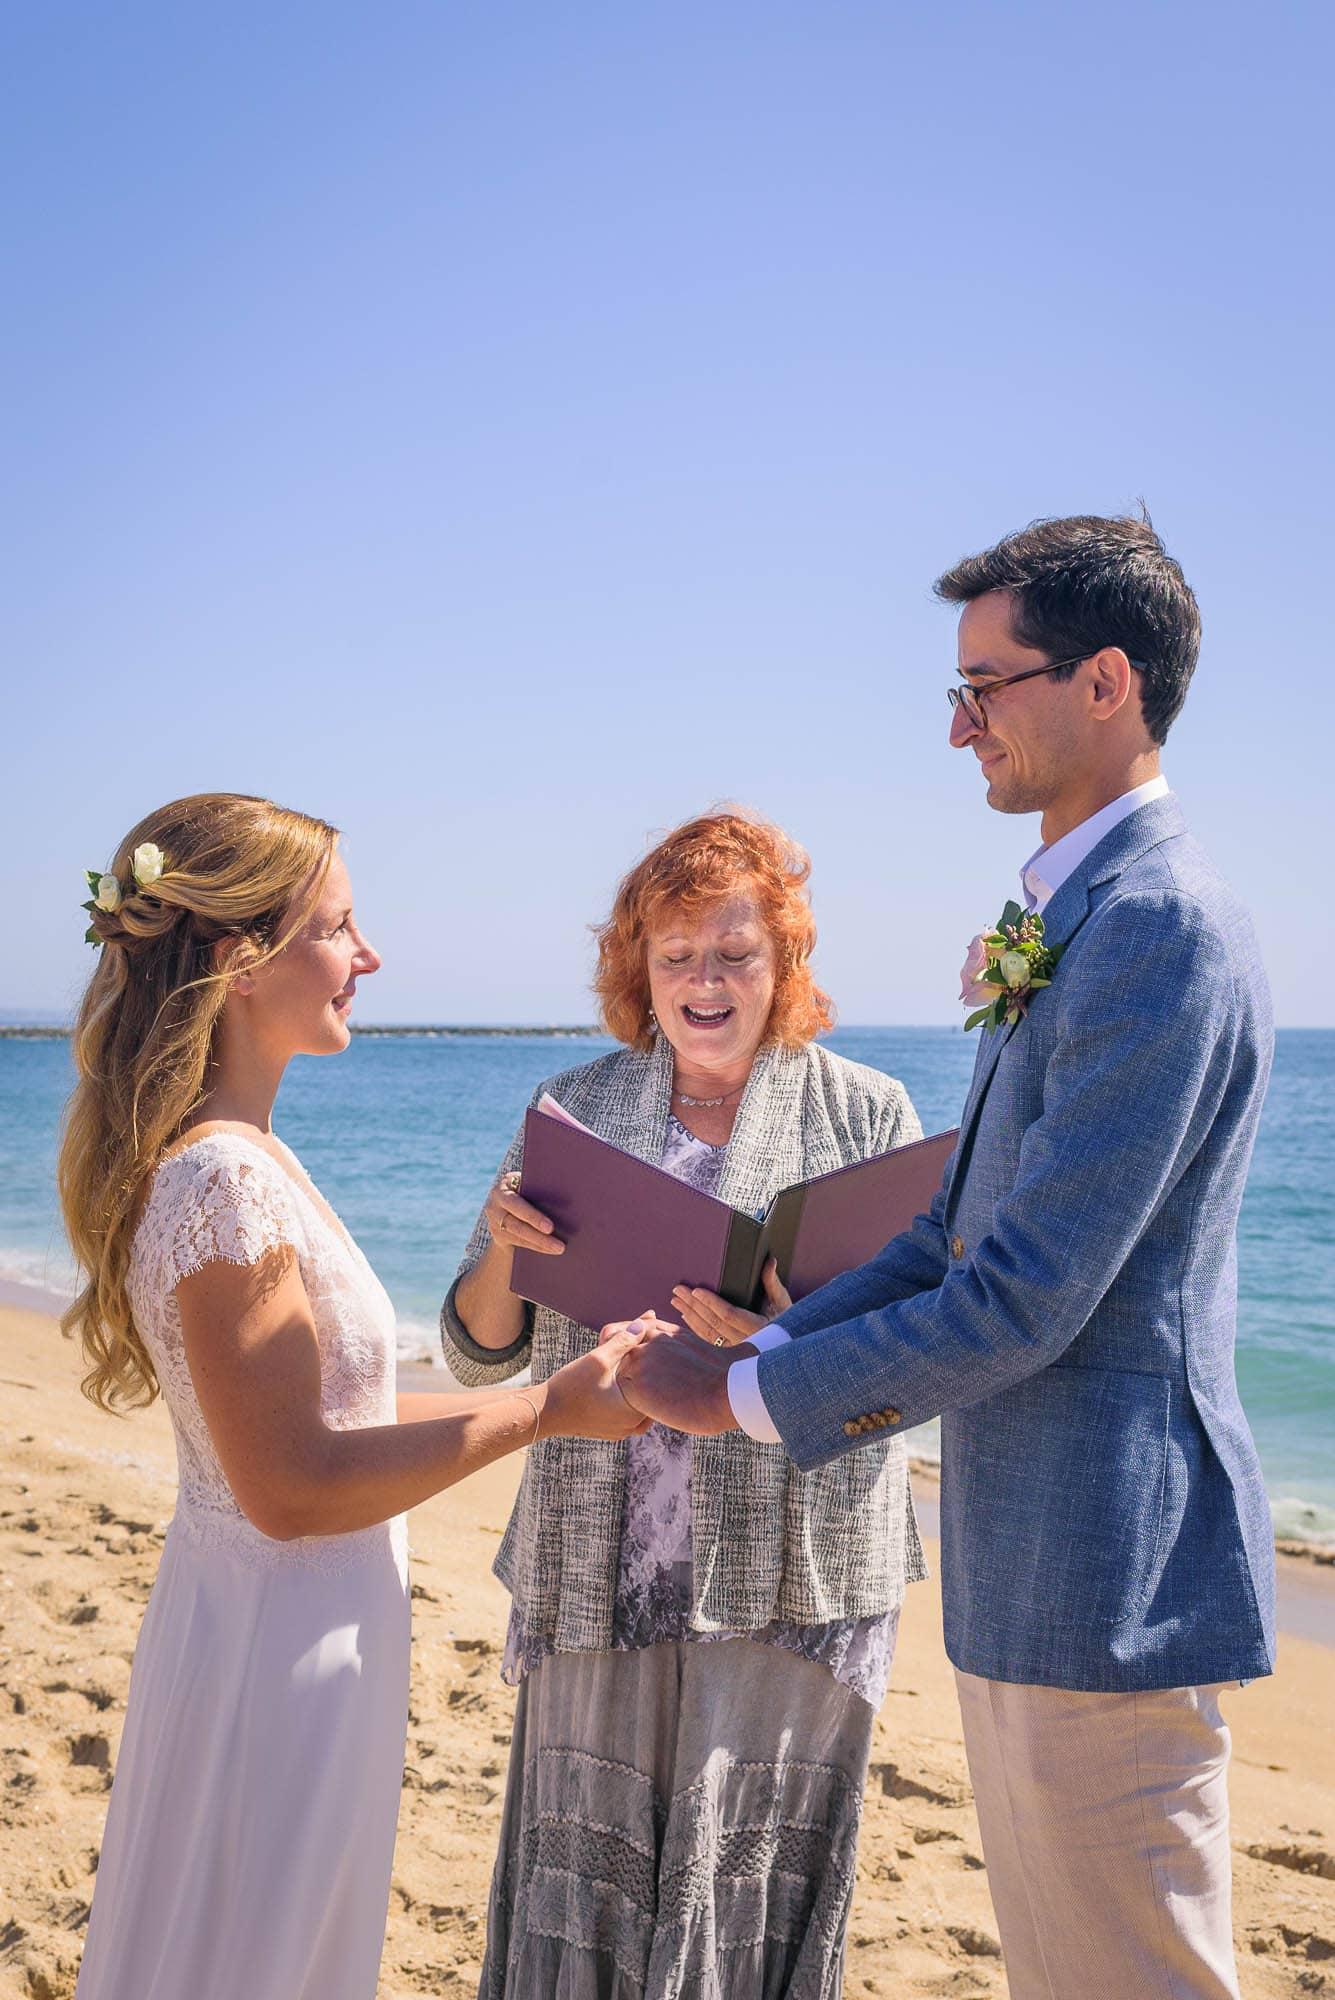 027_Alan_and_Heidi_Wedding_Verena_Andreas